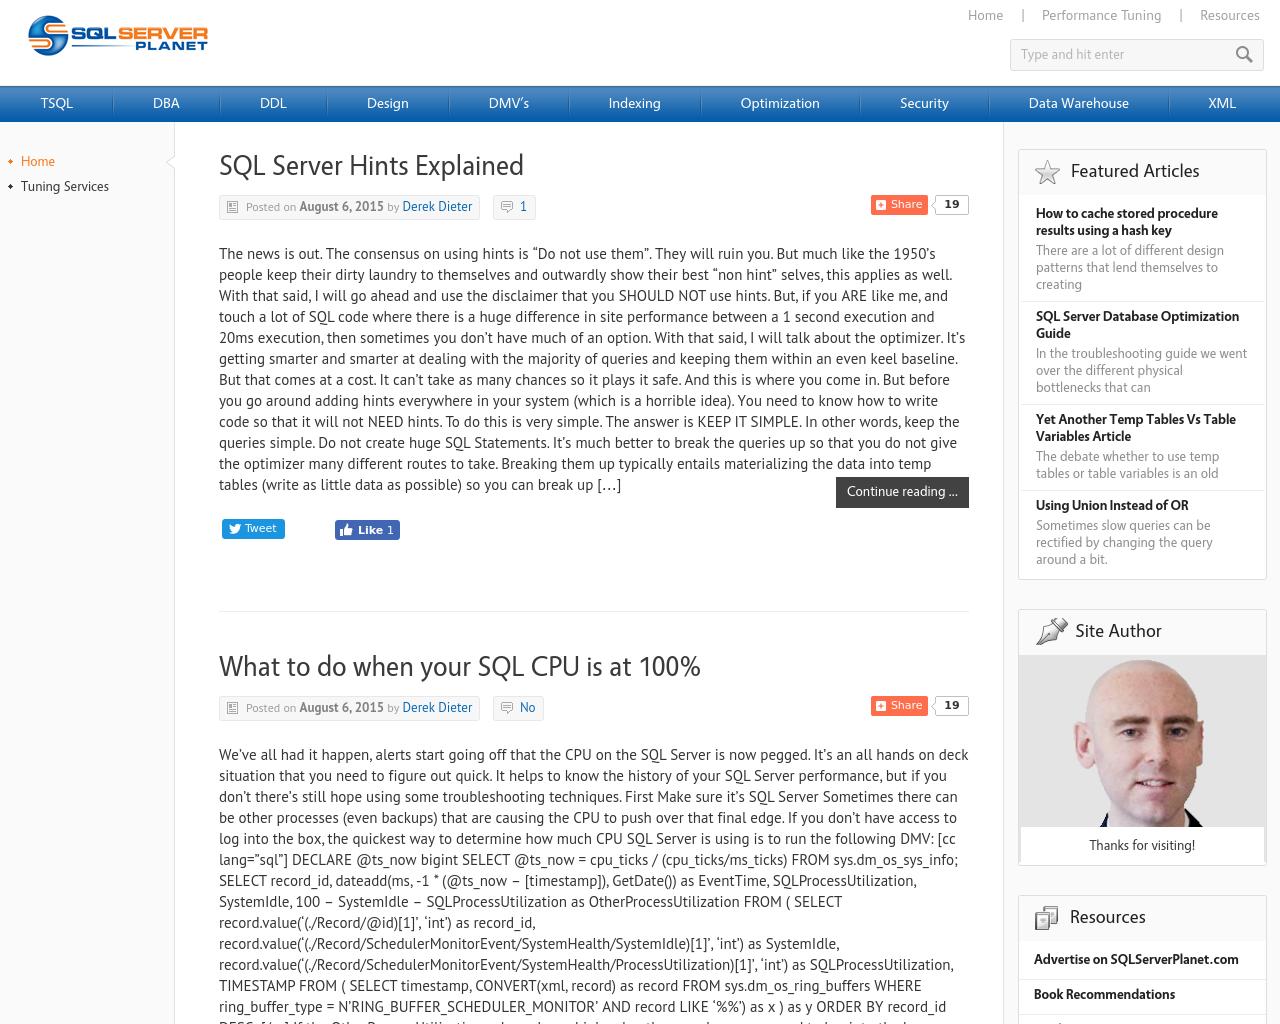 SQL-Server-Planet-Advertising-Reviews-Pricing